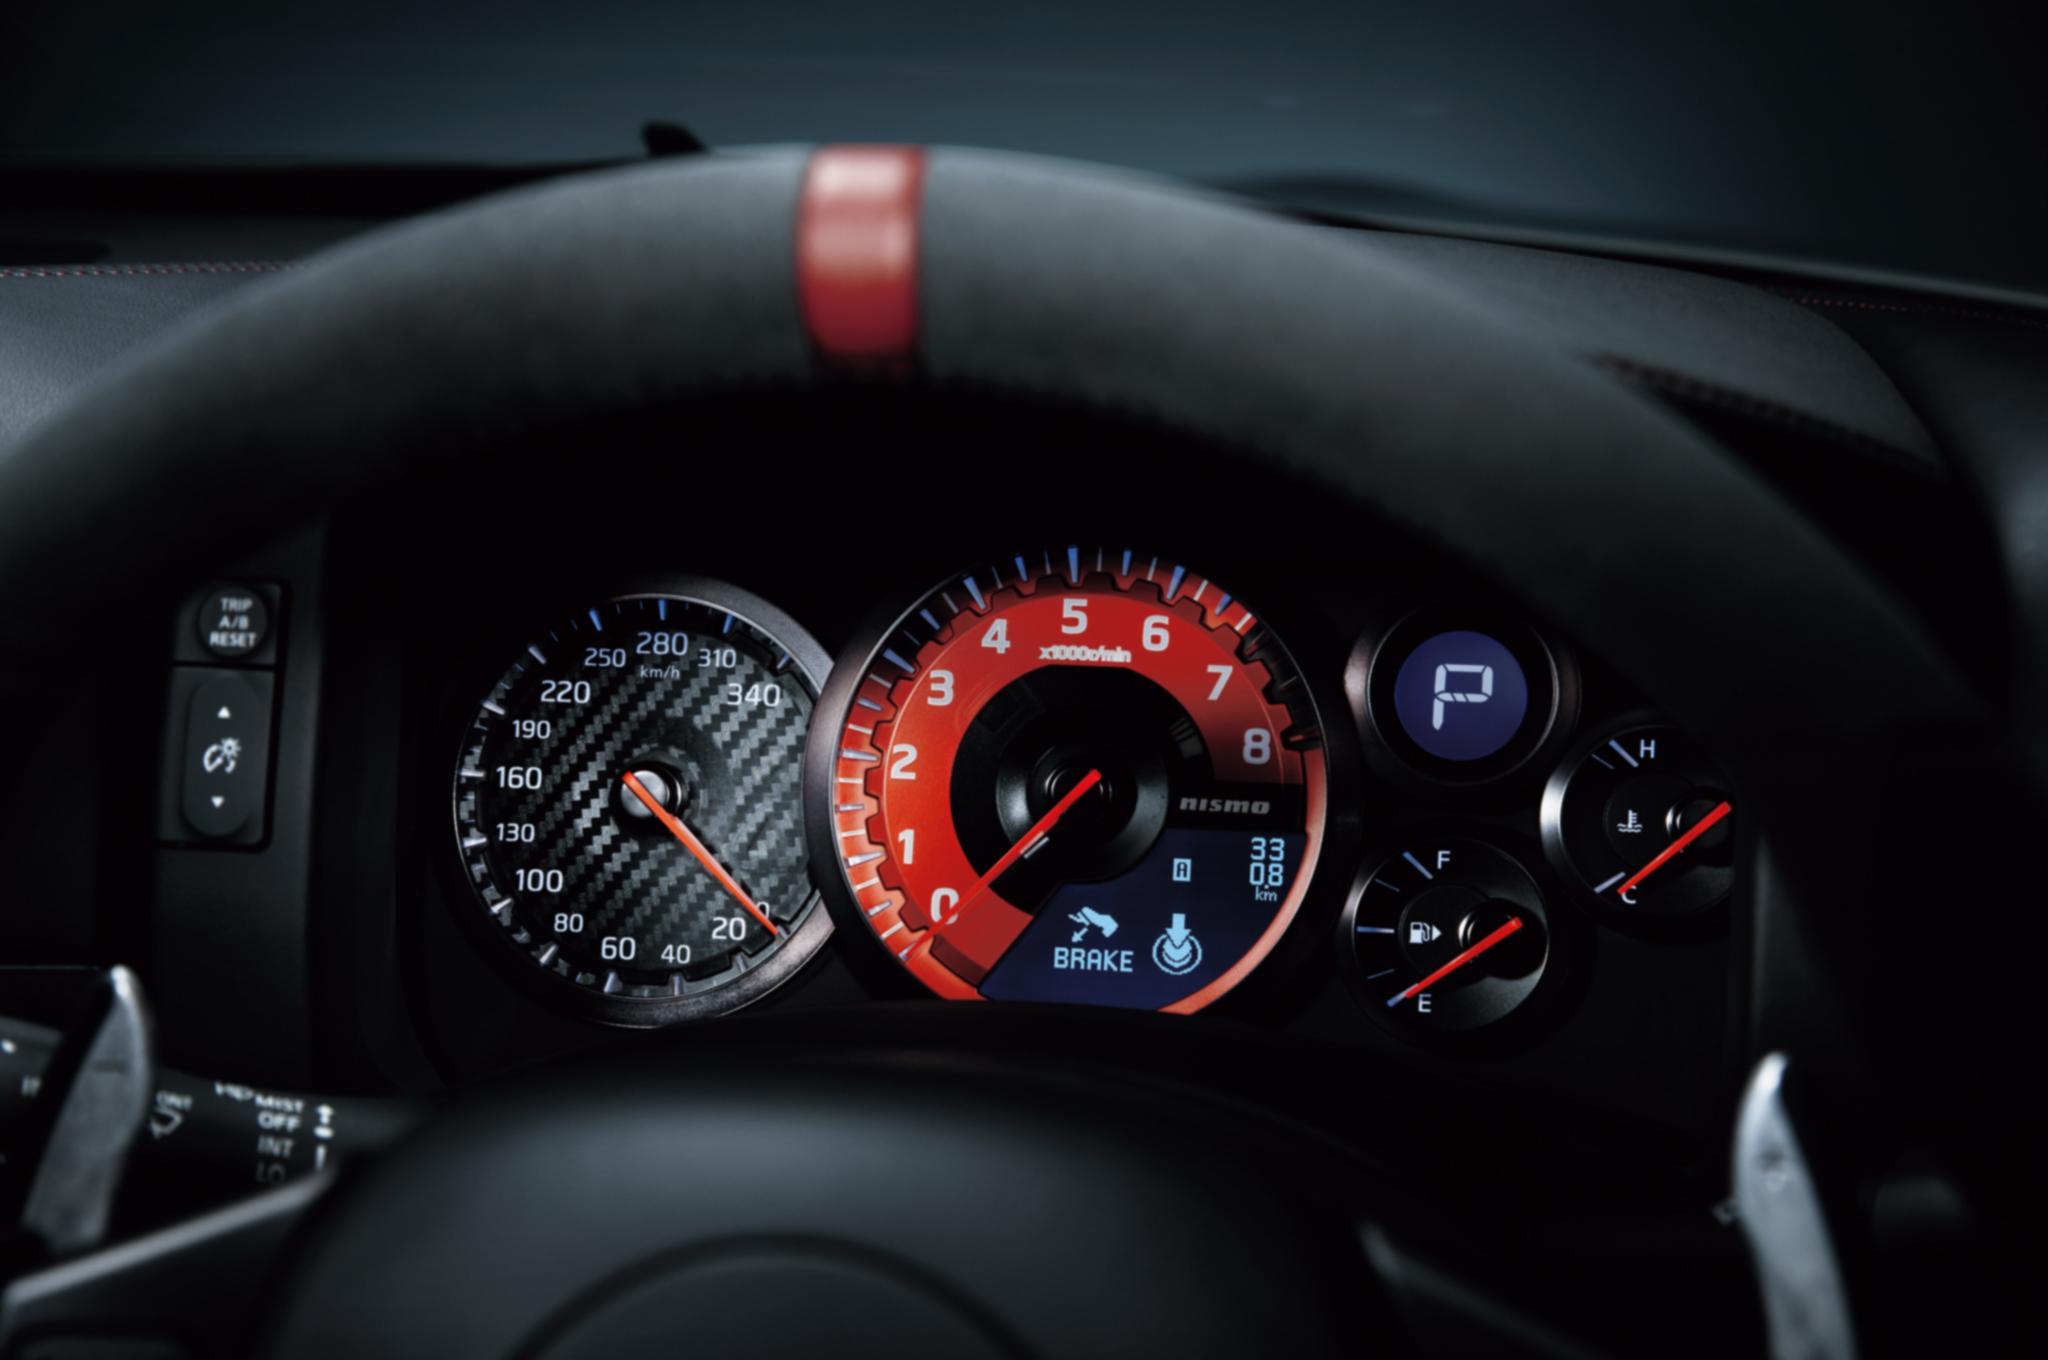 2015-Nissan-GT-R-Nismo-instrument-gauges